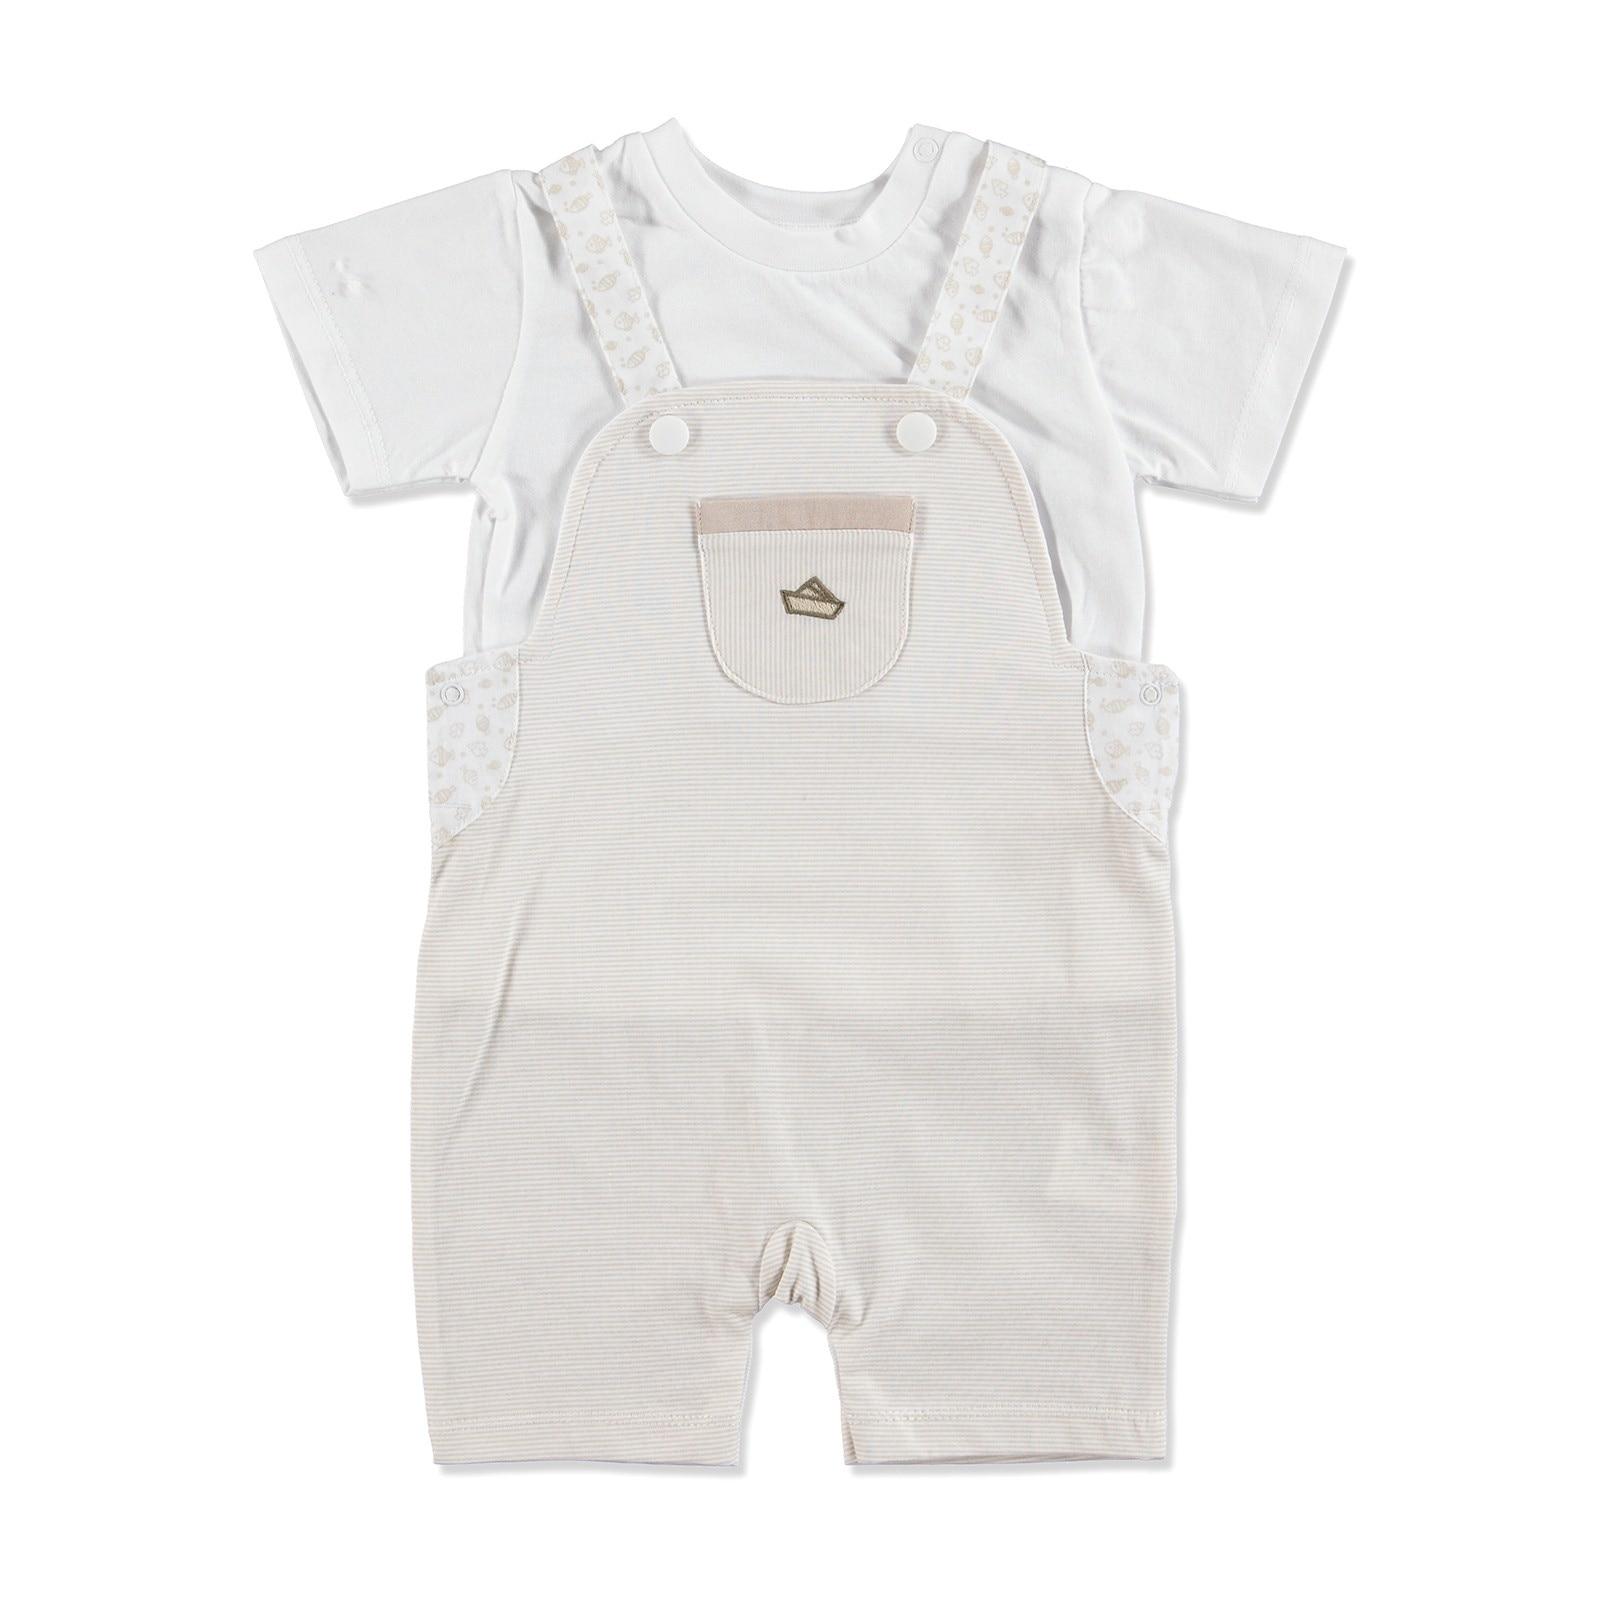 Ebebek HelloBaby Summer Baby The Best Sailor Dungarees T-shirt Set